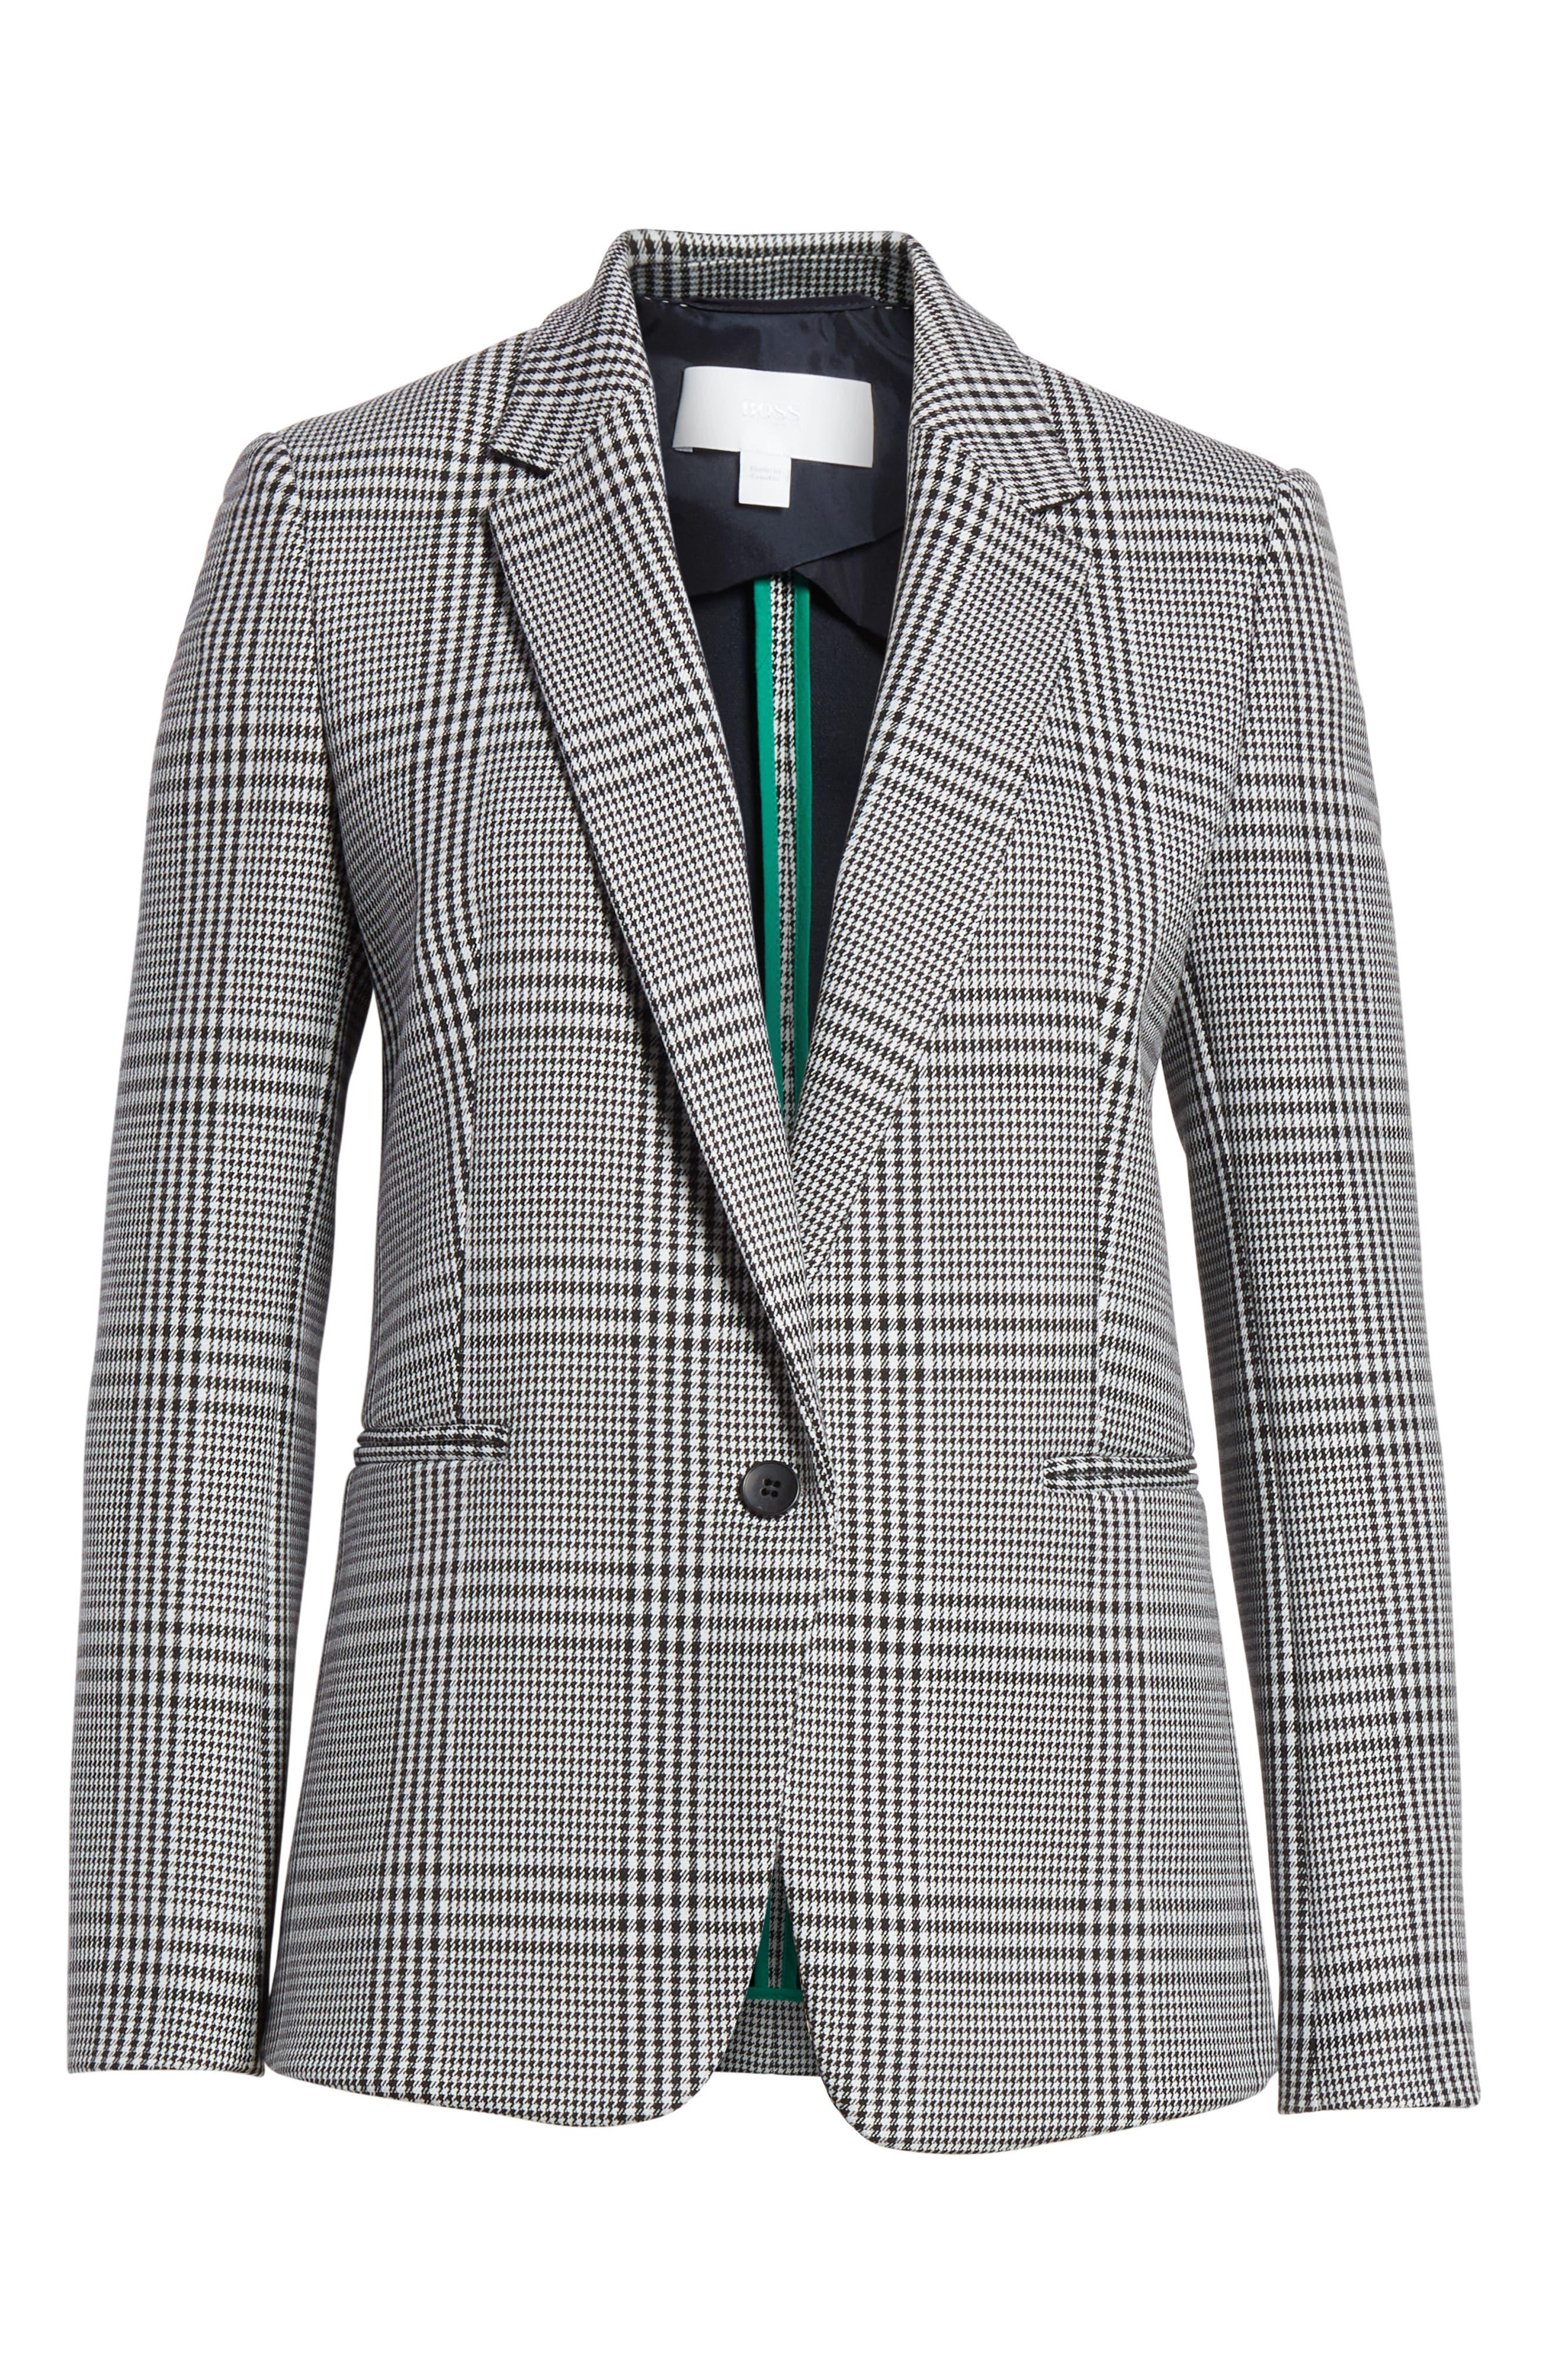 Jemaromina Glen Plaid Suit Jacket,                             Alternate thumbnail 5, color,                             020